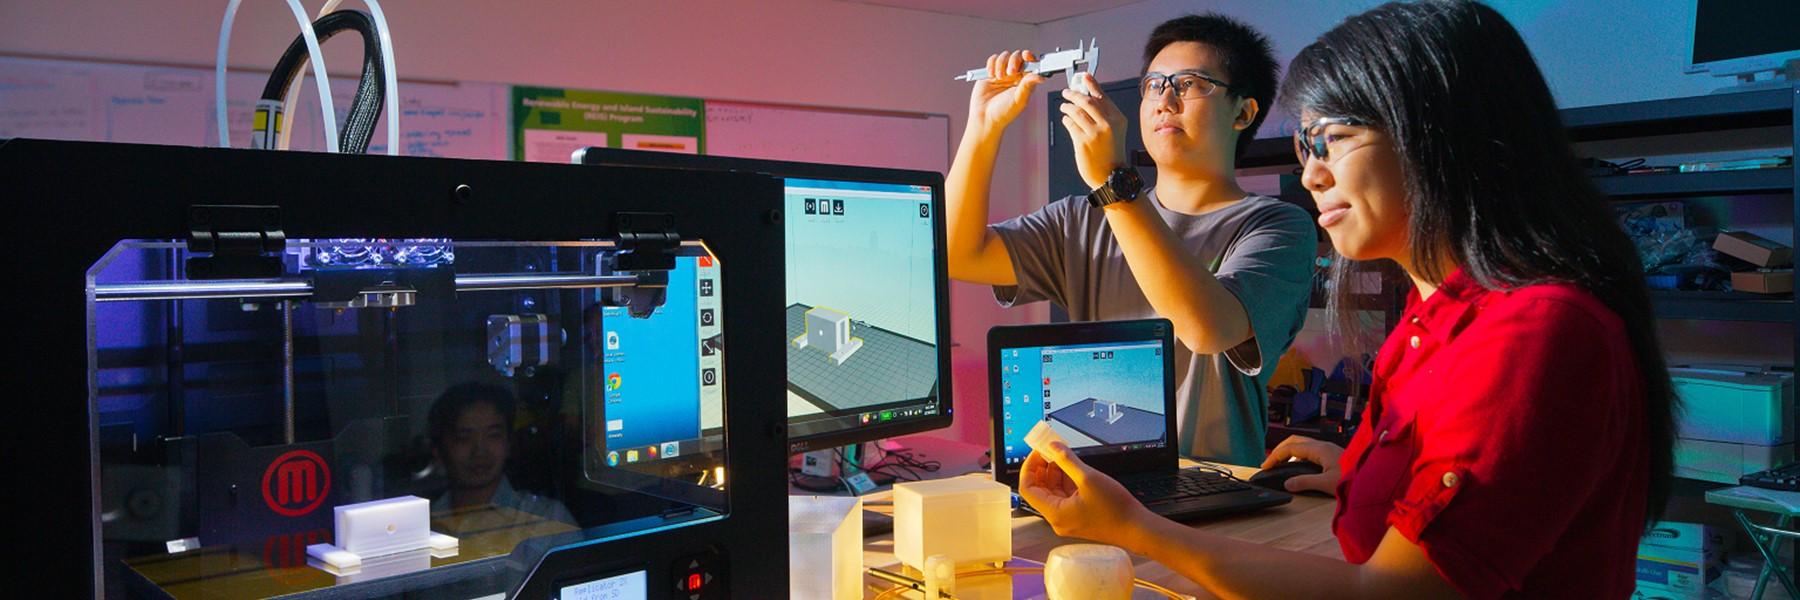 Students Operating A 3D Printer.